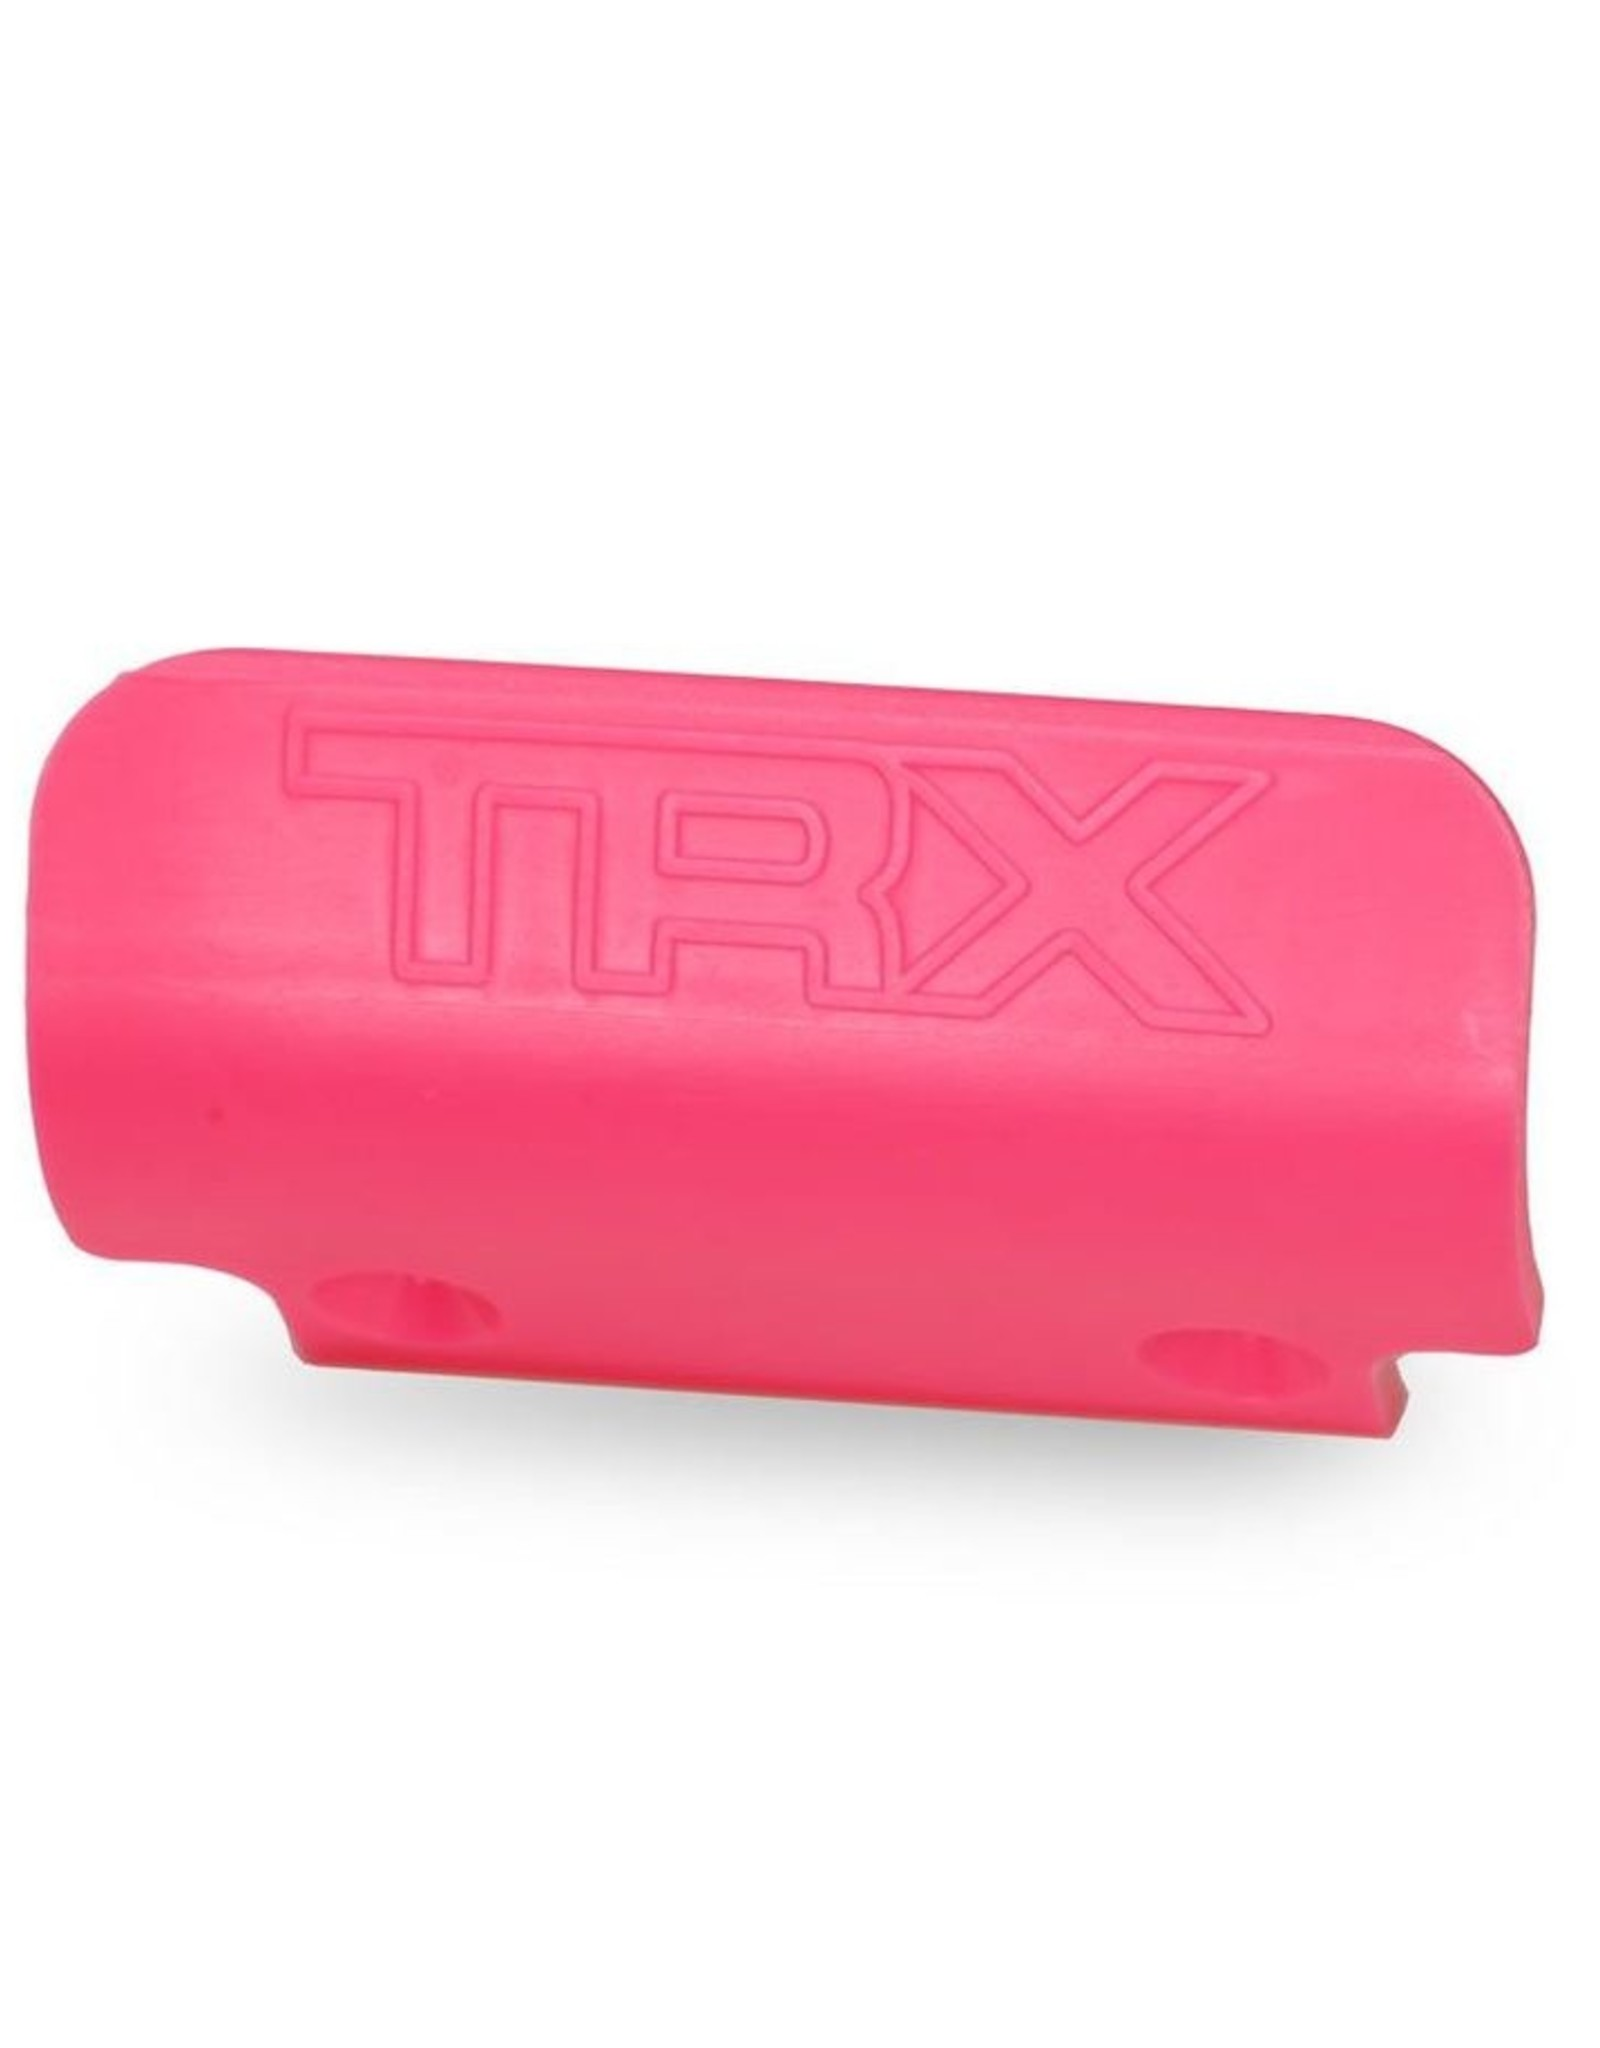 Traxxas Traxxas Pink Front Bumper TRA2735P